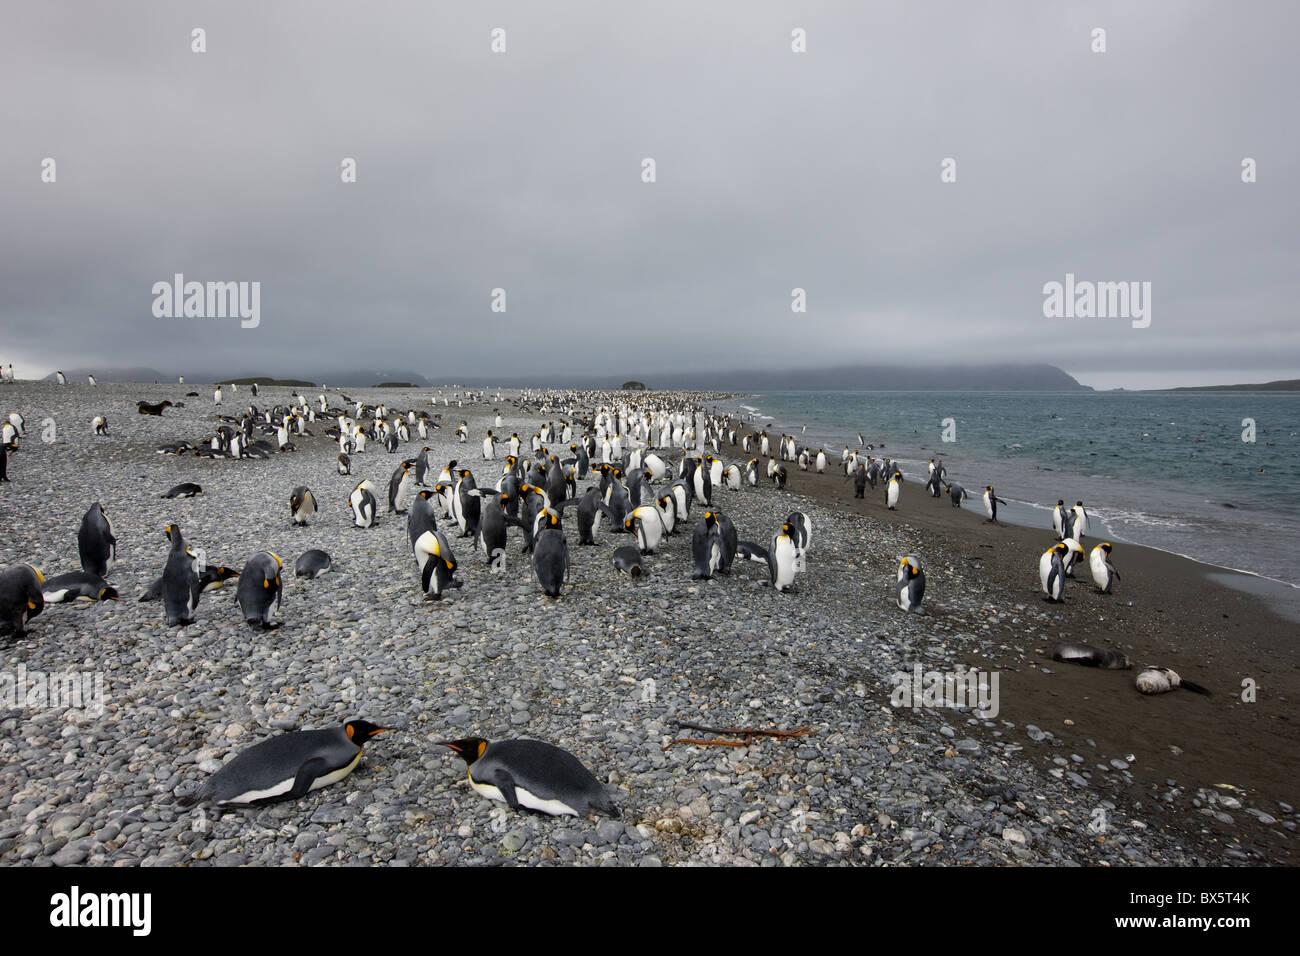 King penguin colony (Aptenodytes patagonicus), Salisbury Plain, South Georgia, Antarctic, Polar Regions - Stock Image